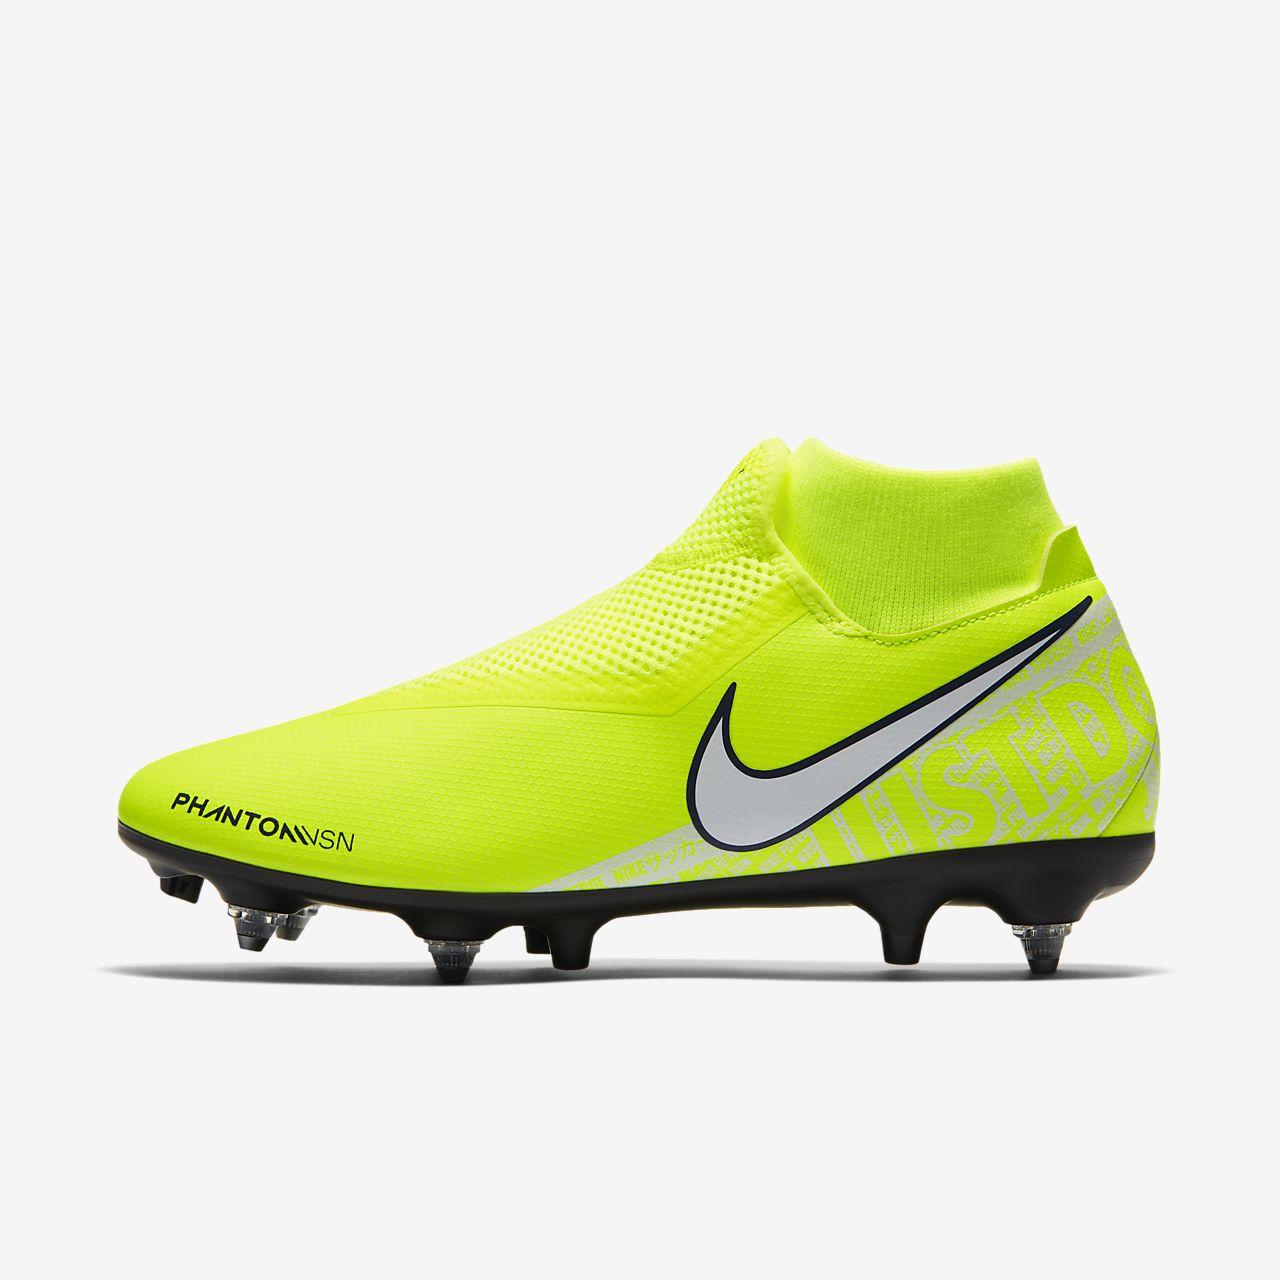 Футбольные бутсы для игры на мягком грунте Nike PhantomVSN Academy Dynamic Fit SG-Pro Anti-Clog Traction